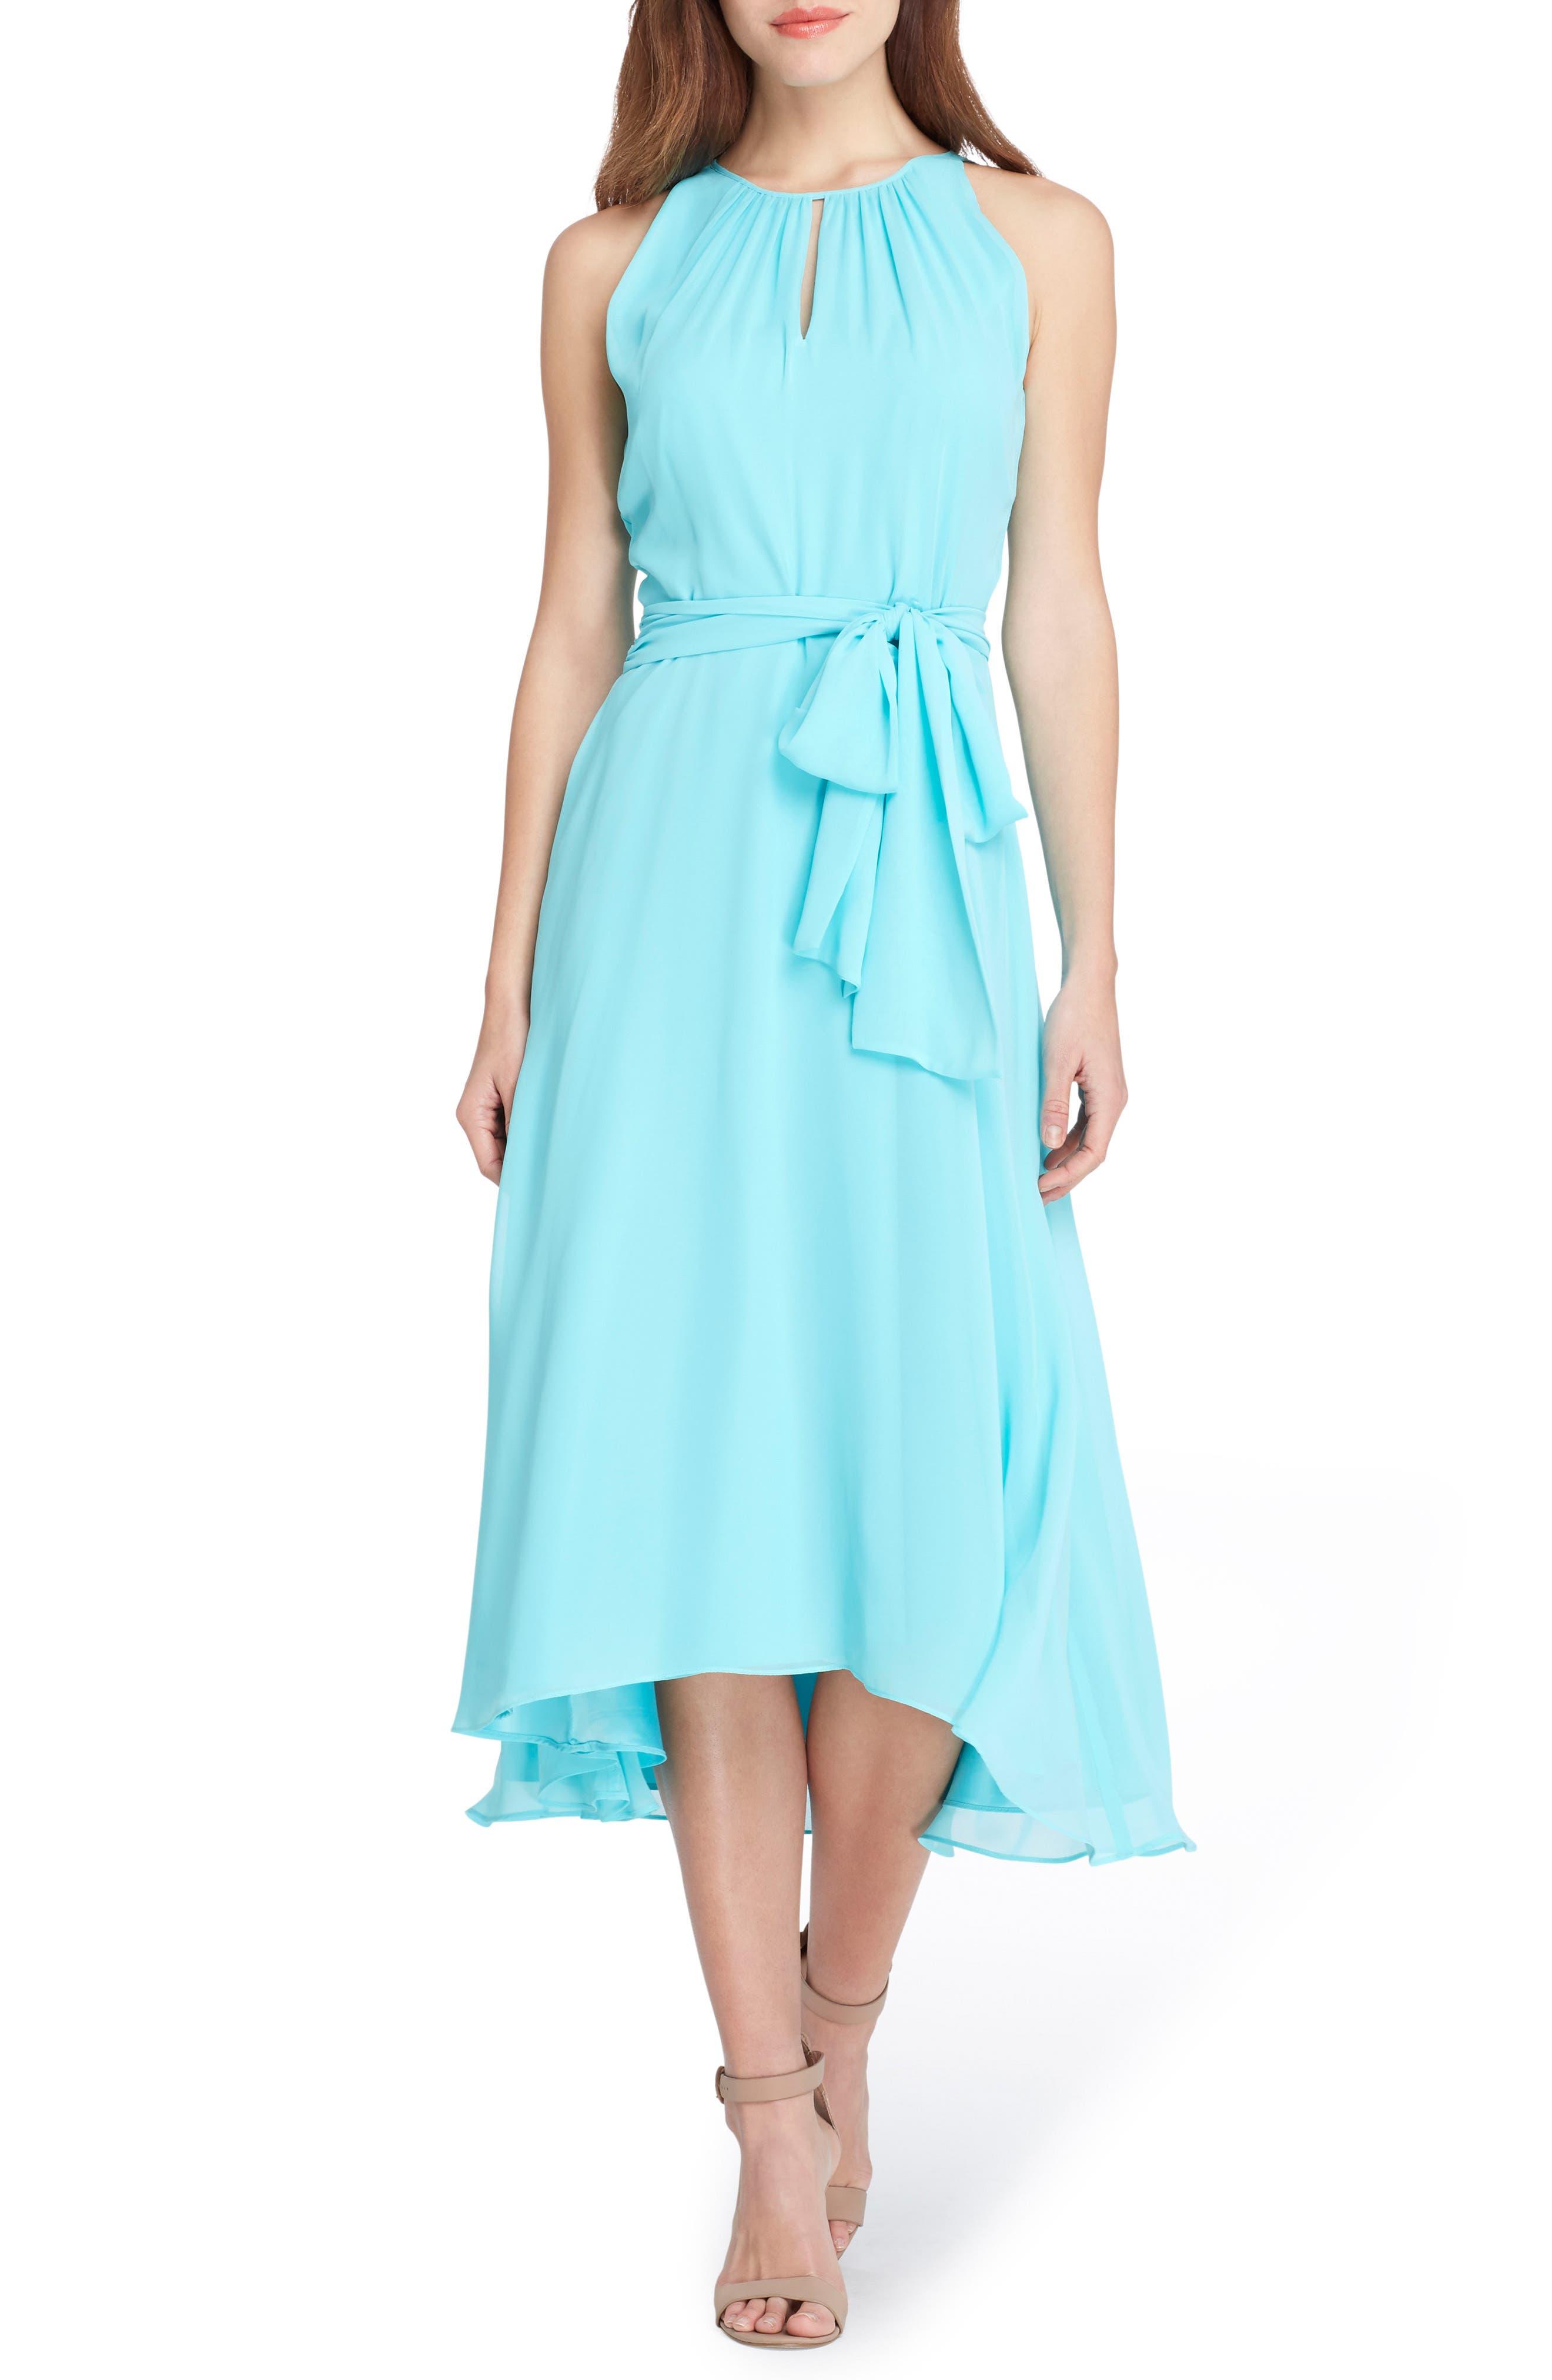 Tahari Evening Midi Dresses